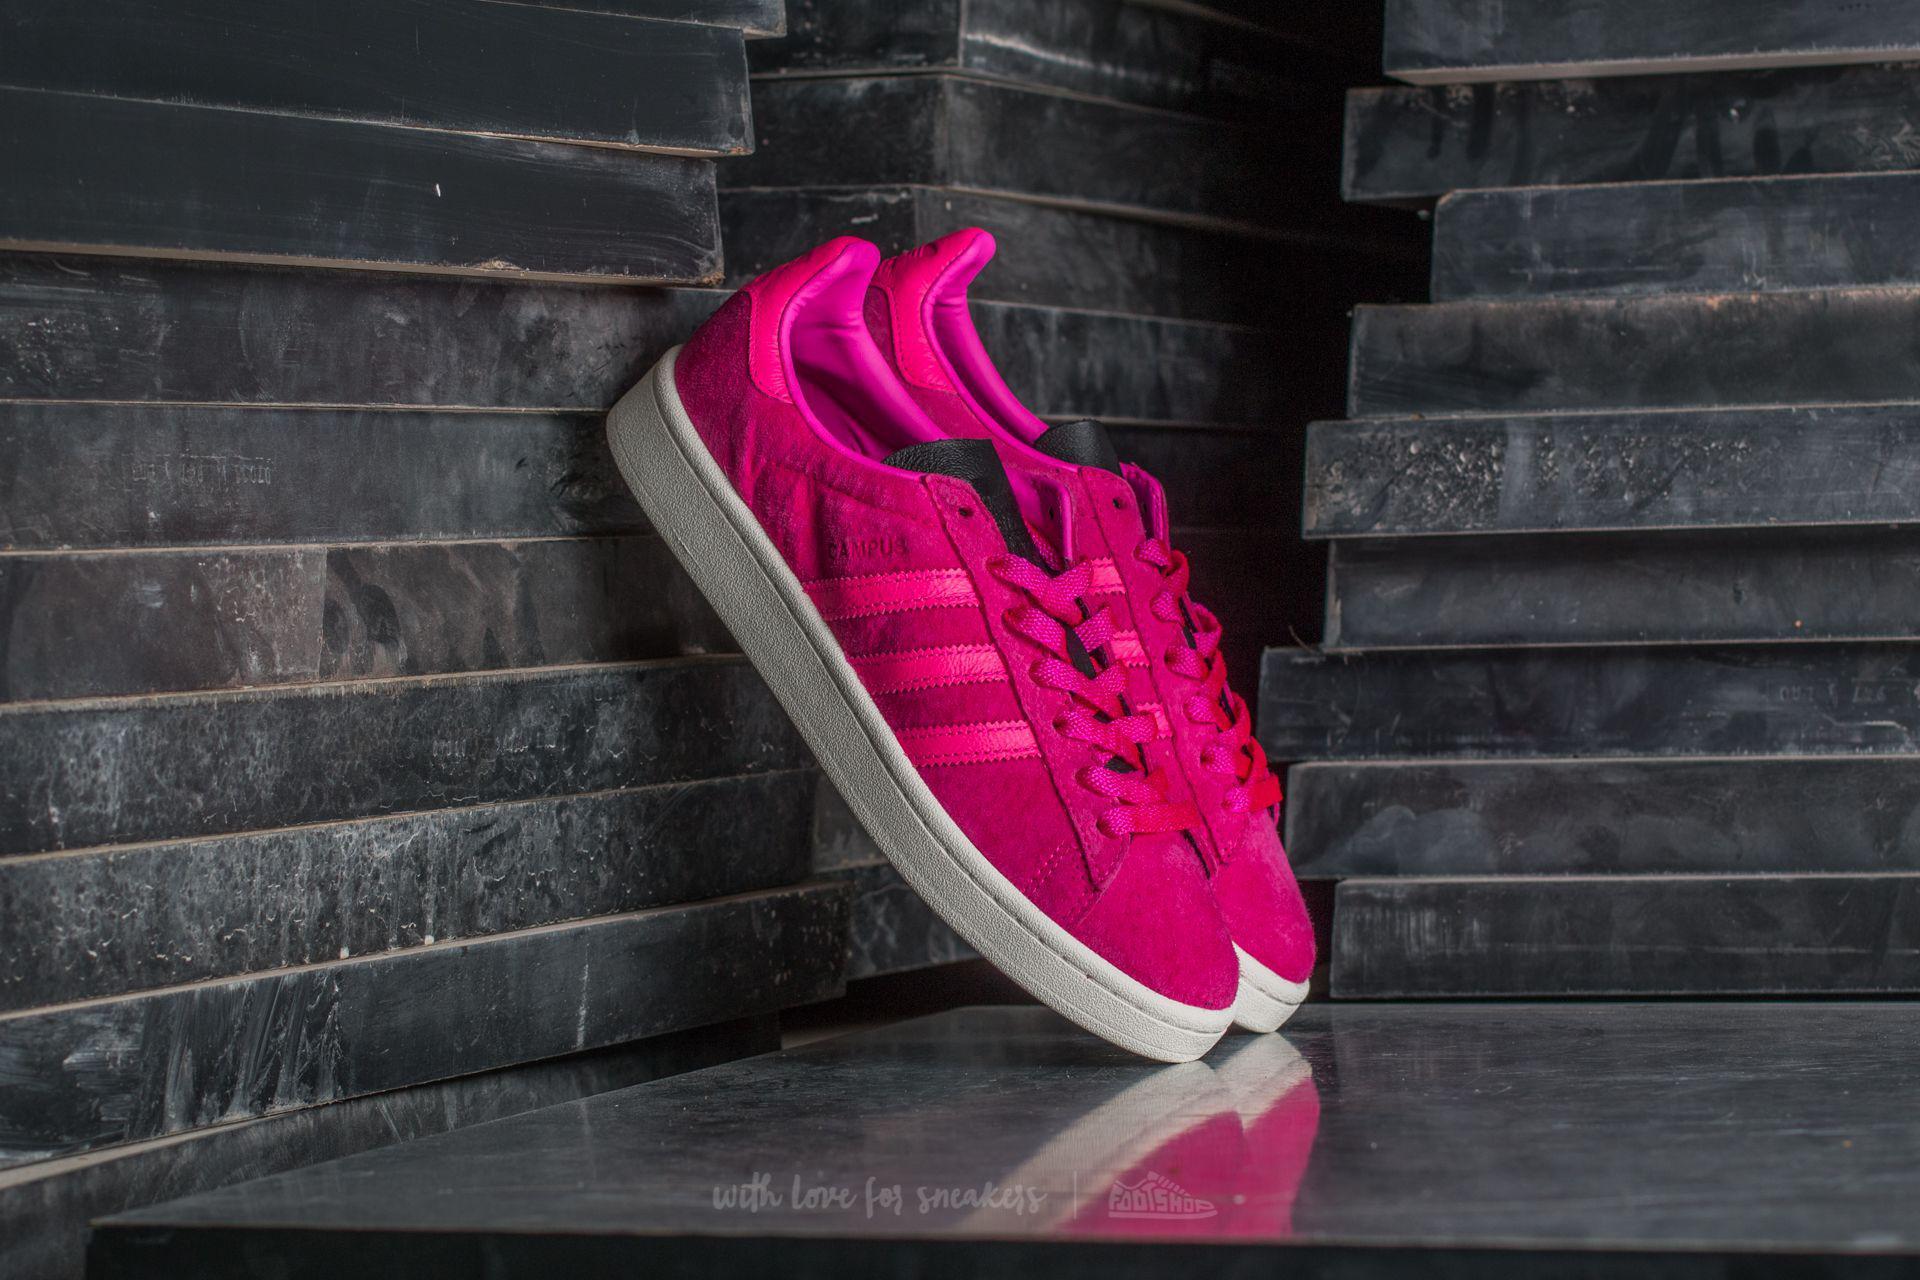 Lyst - adidas Originals Adidas Campus Shock Pink  Core Black in Pink 6291f87f4